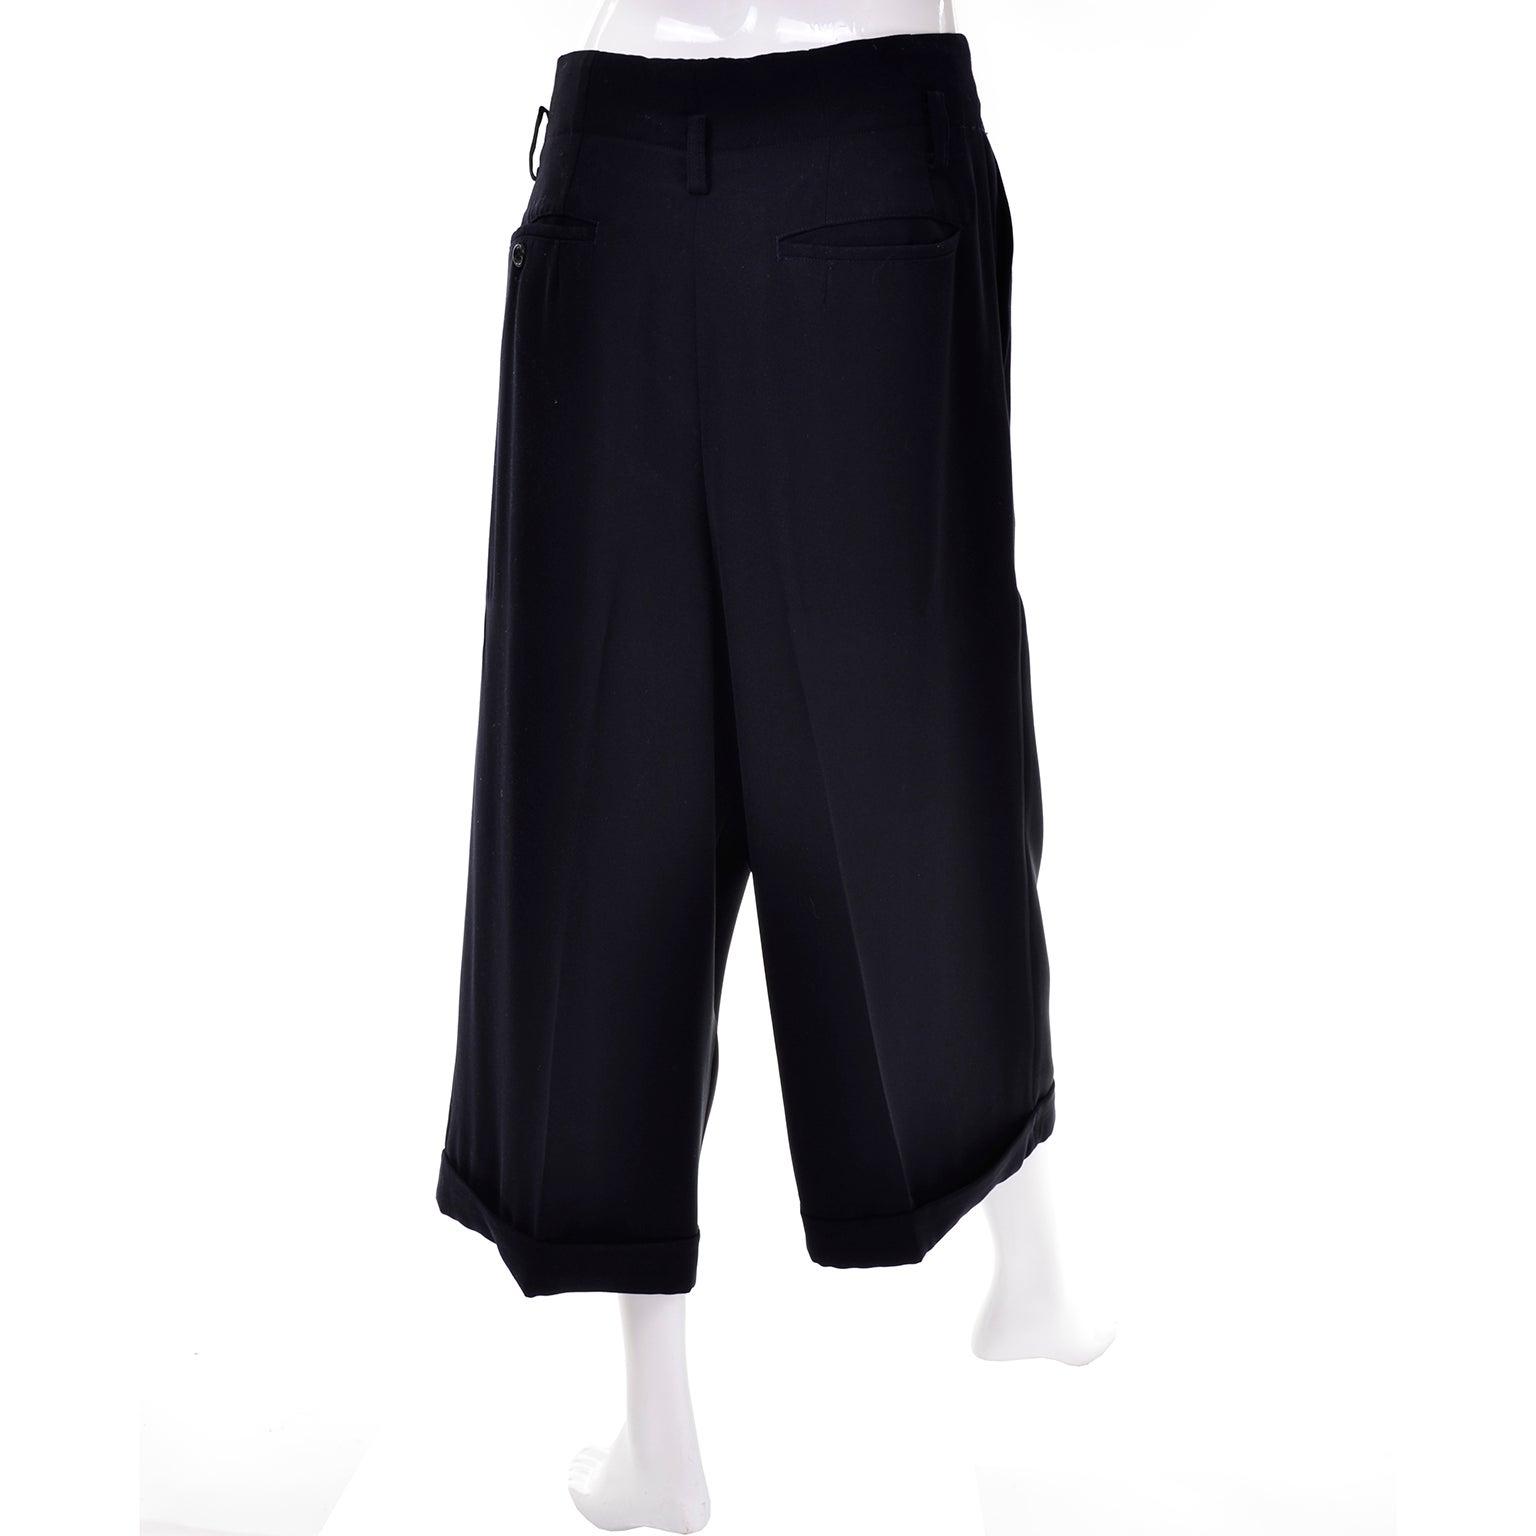 1b782fe7c507 Comme des Garcons Vintage Cropped Oversized Pants Medium For Sale at 1stdibs